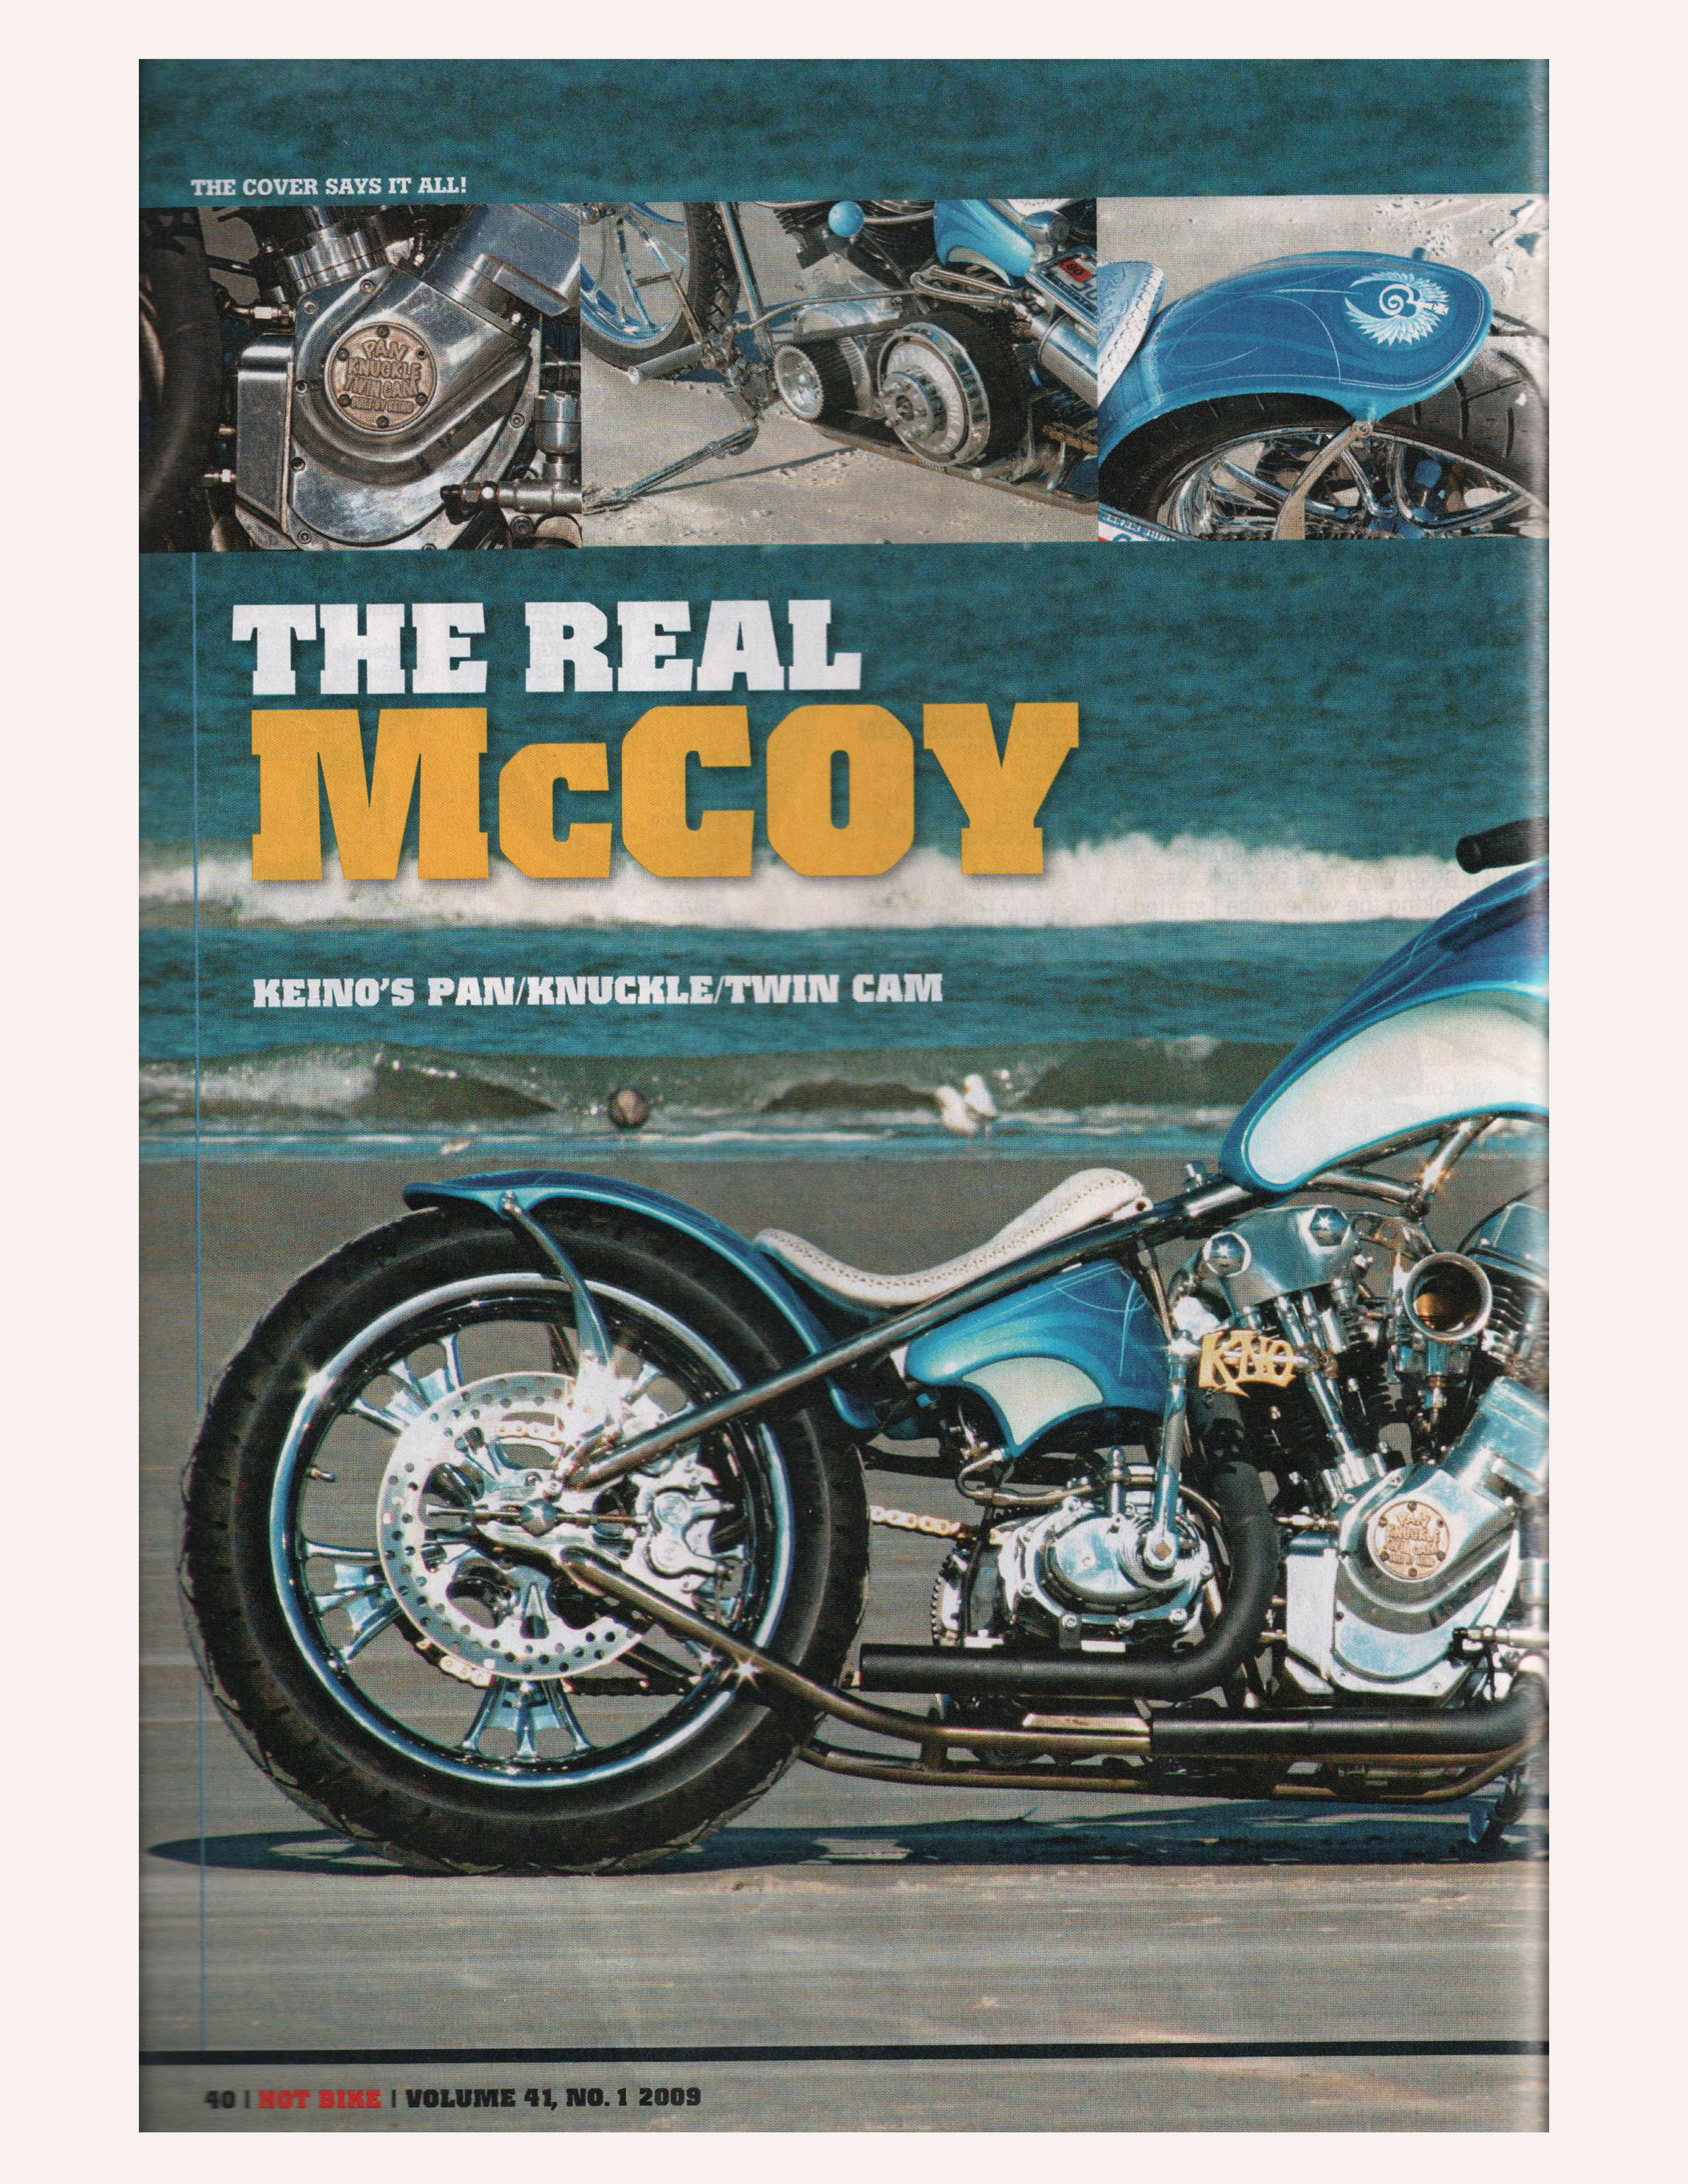 Hotbike Realmcoy1.jpg